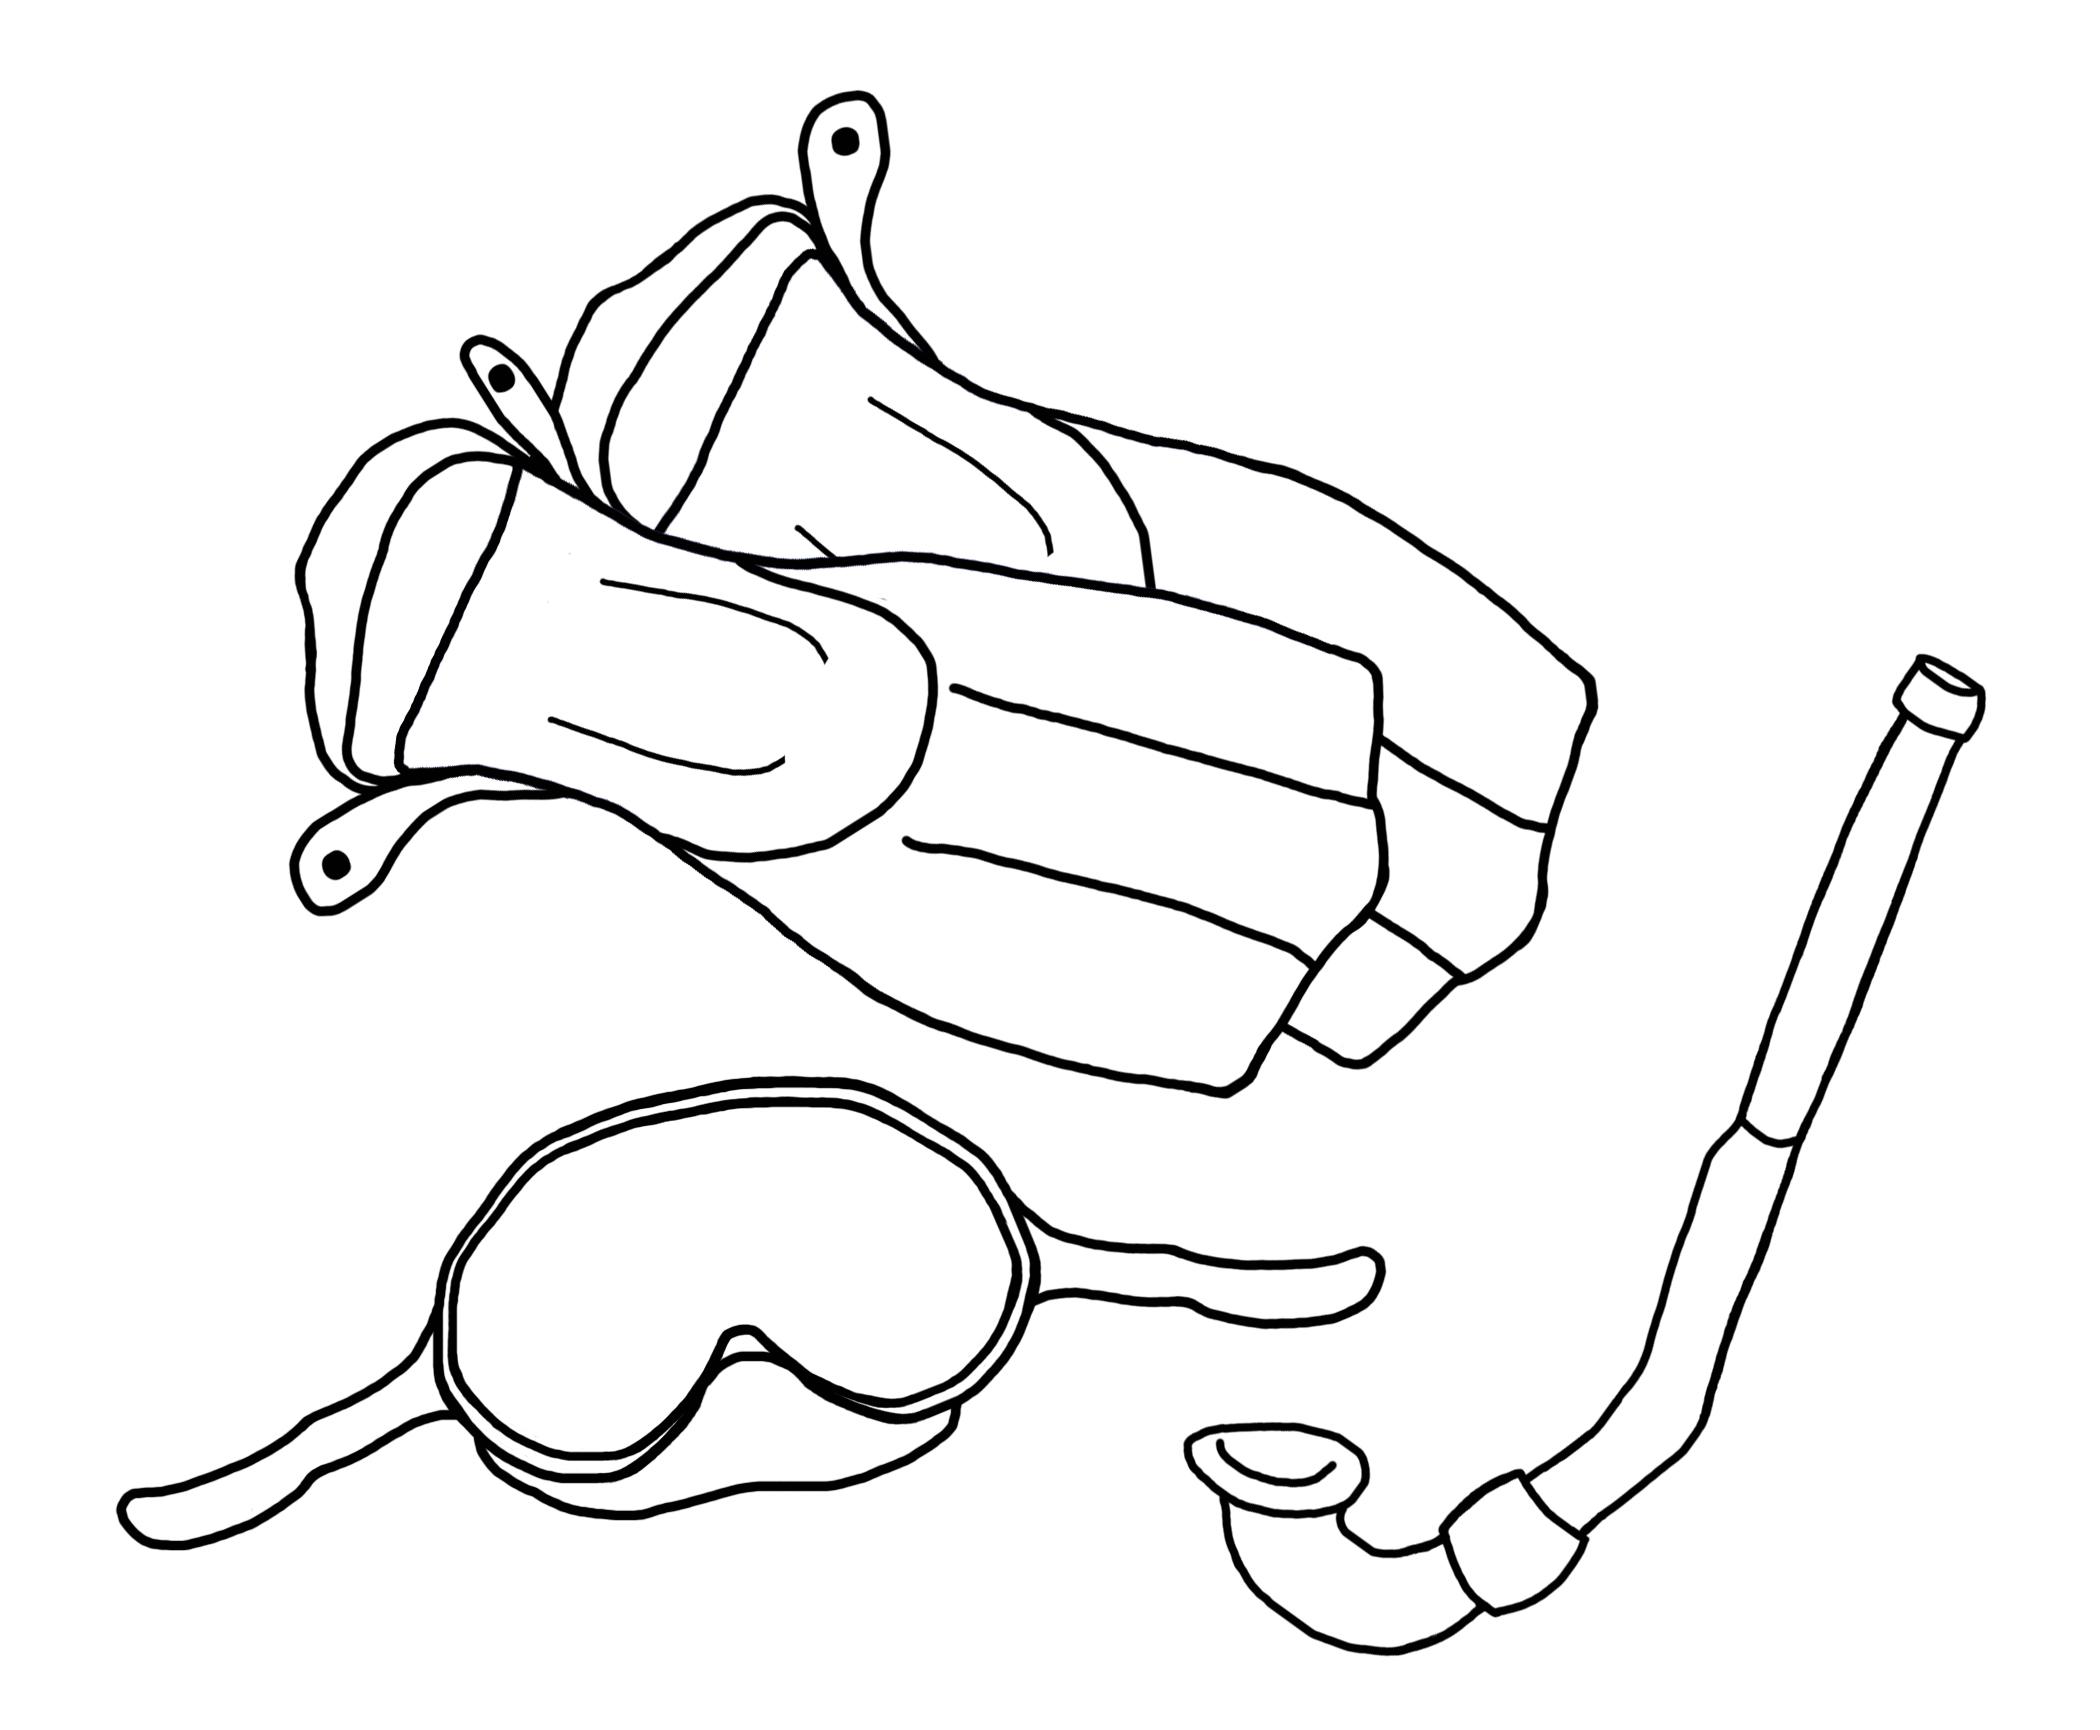 scuba gear coloring pages - photo#15